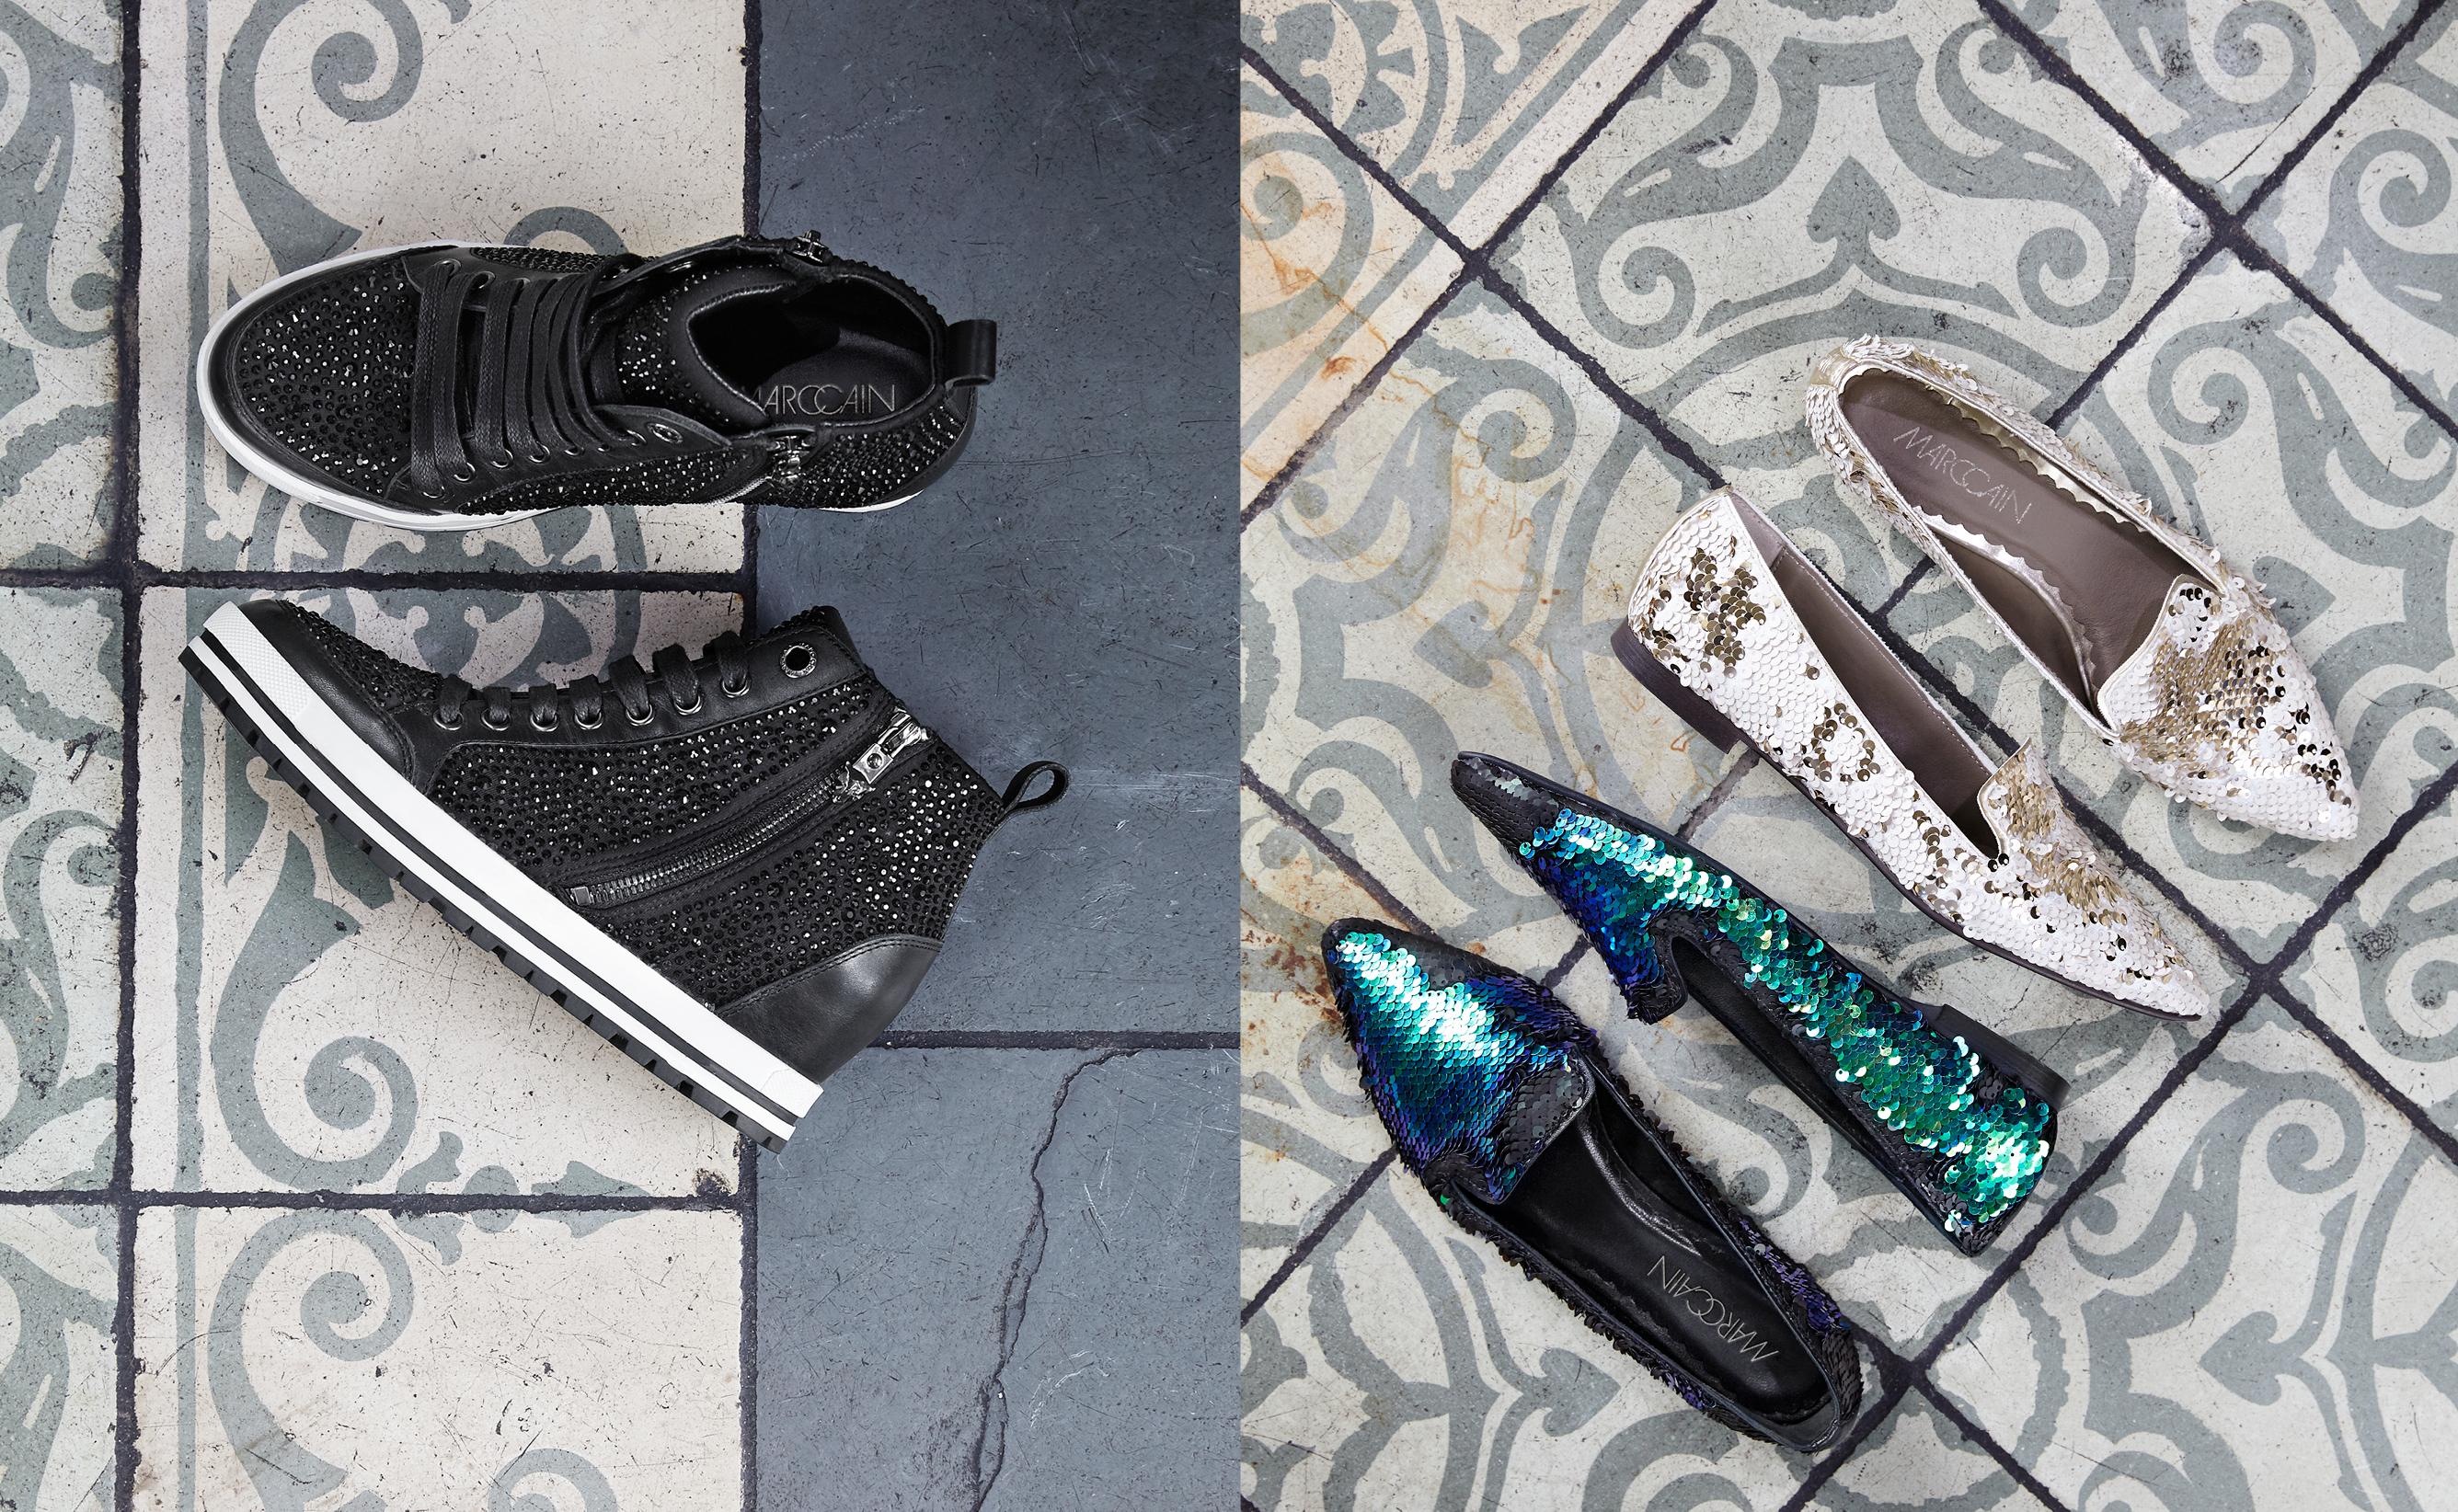 Obuv značky Marc Cain Bags & Shoes ve Van Graafu